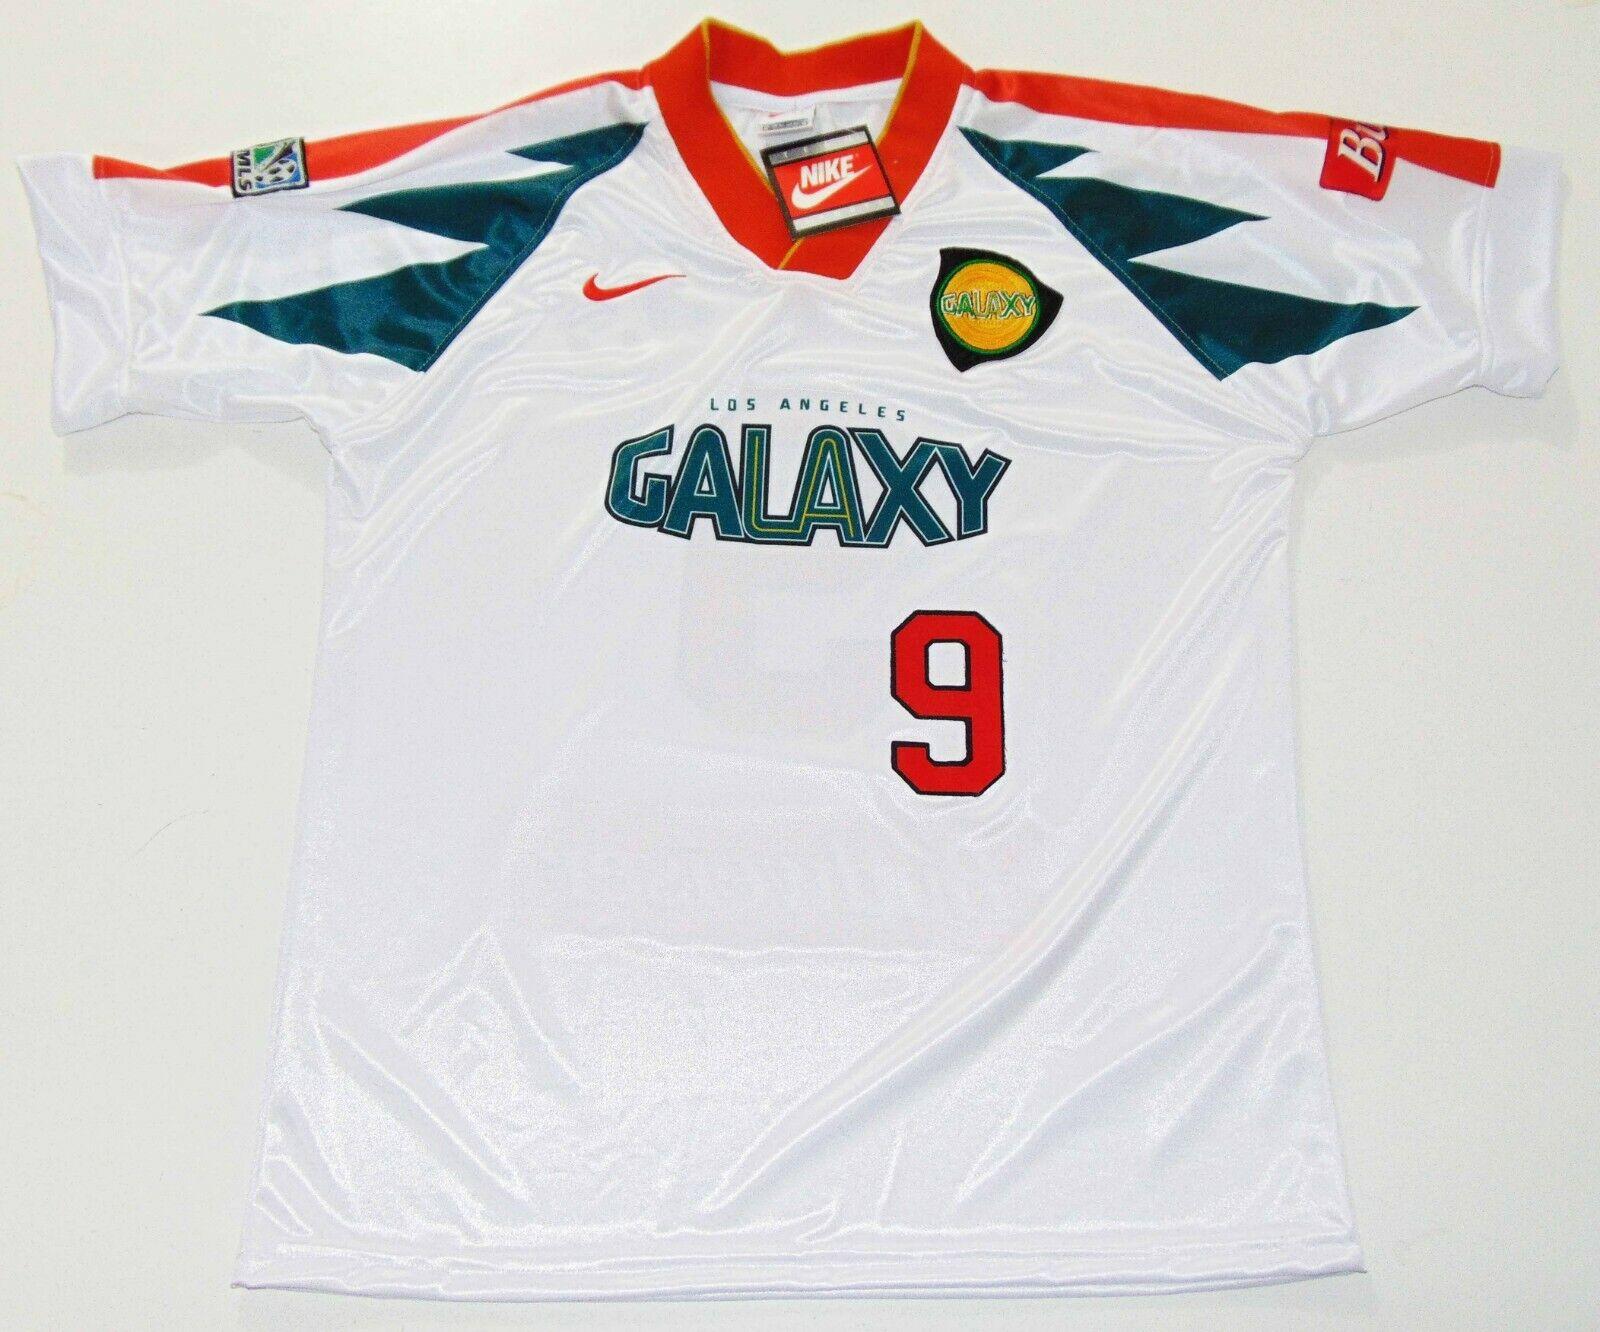 e48fc2888 Los Angeles Galaxy 1996 Jorge Campos Away Jersey Cobi Jones Cienfuegos Shirt  MLS